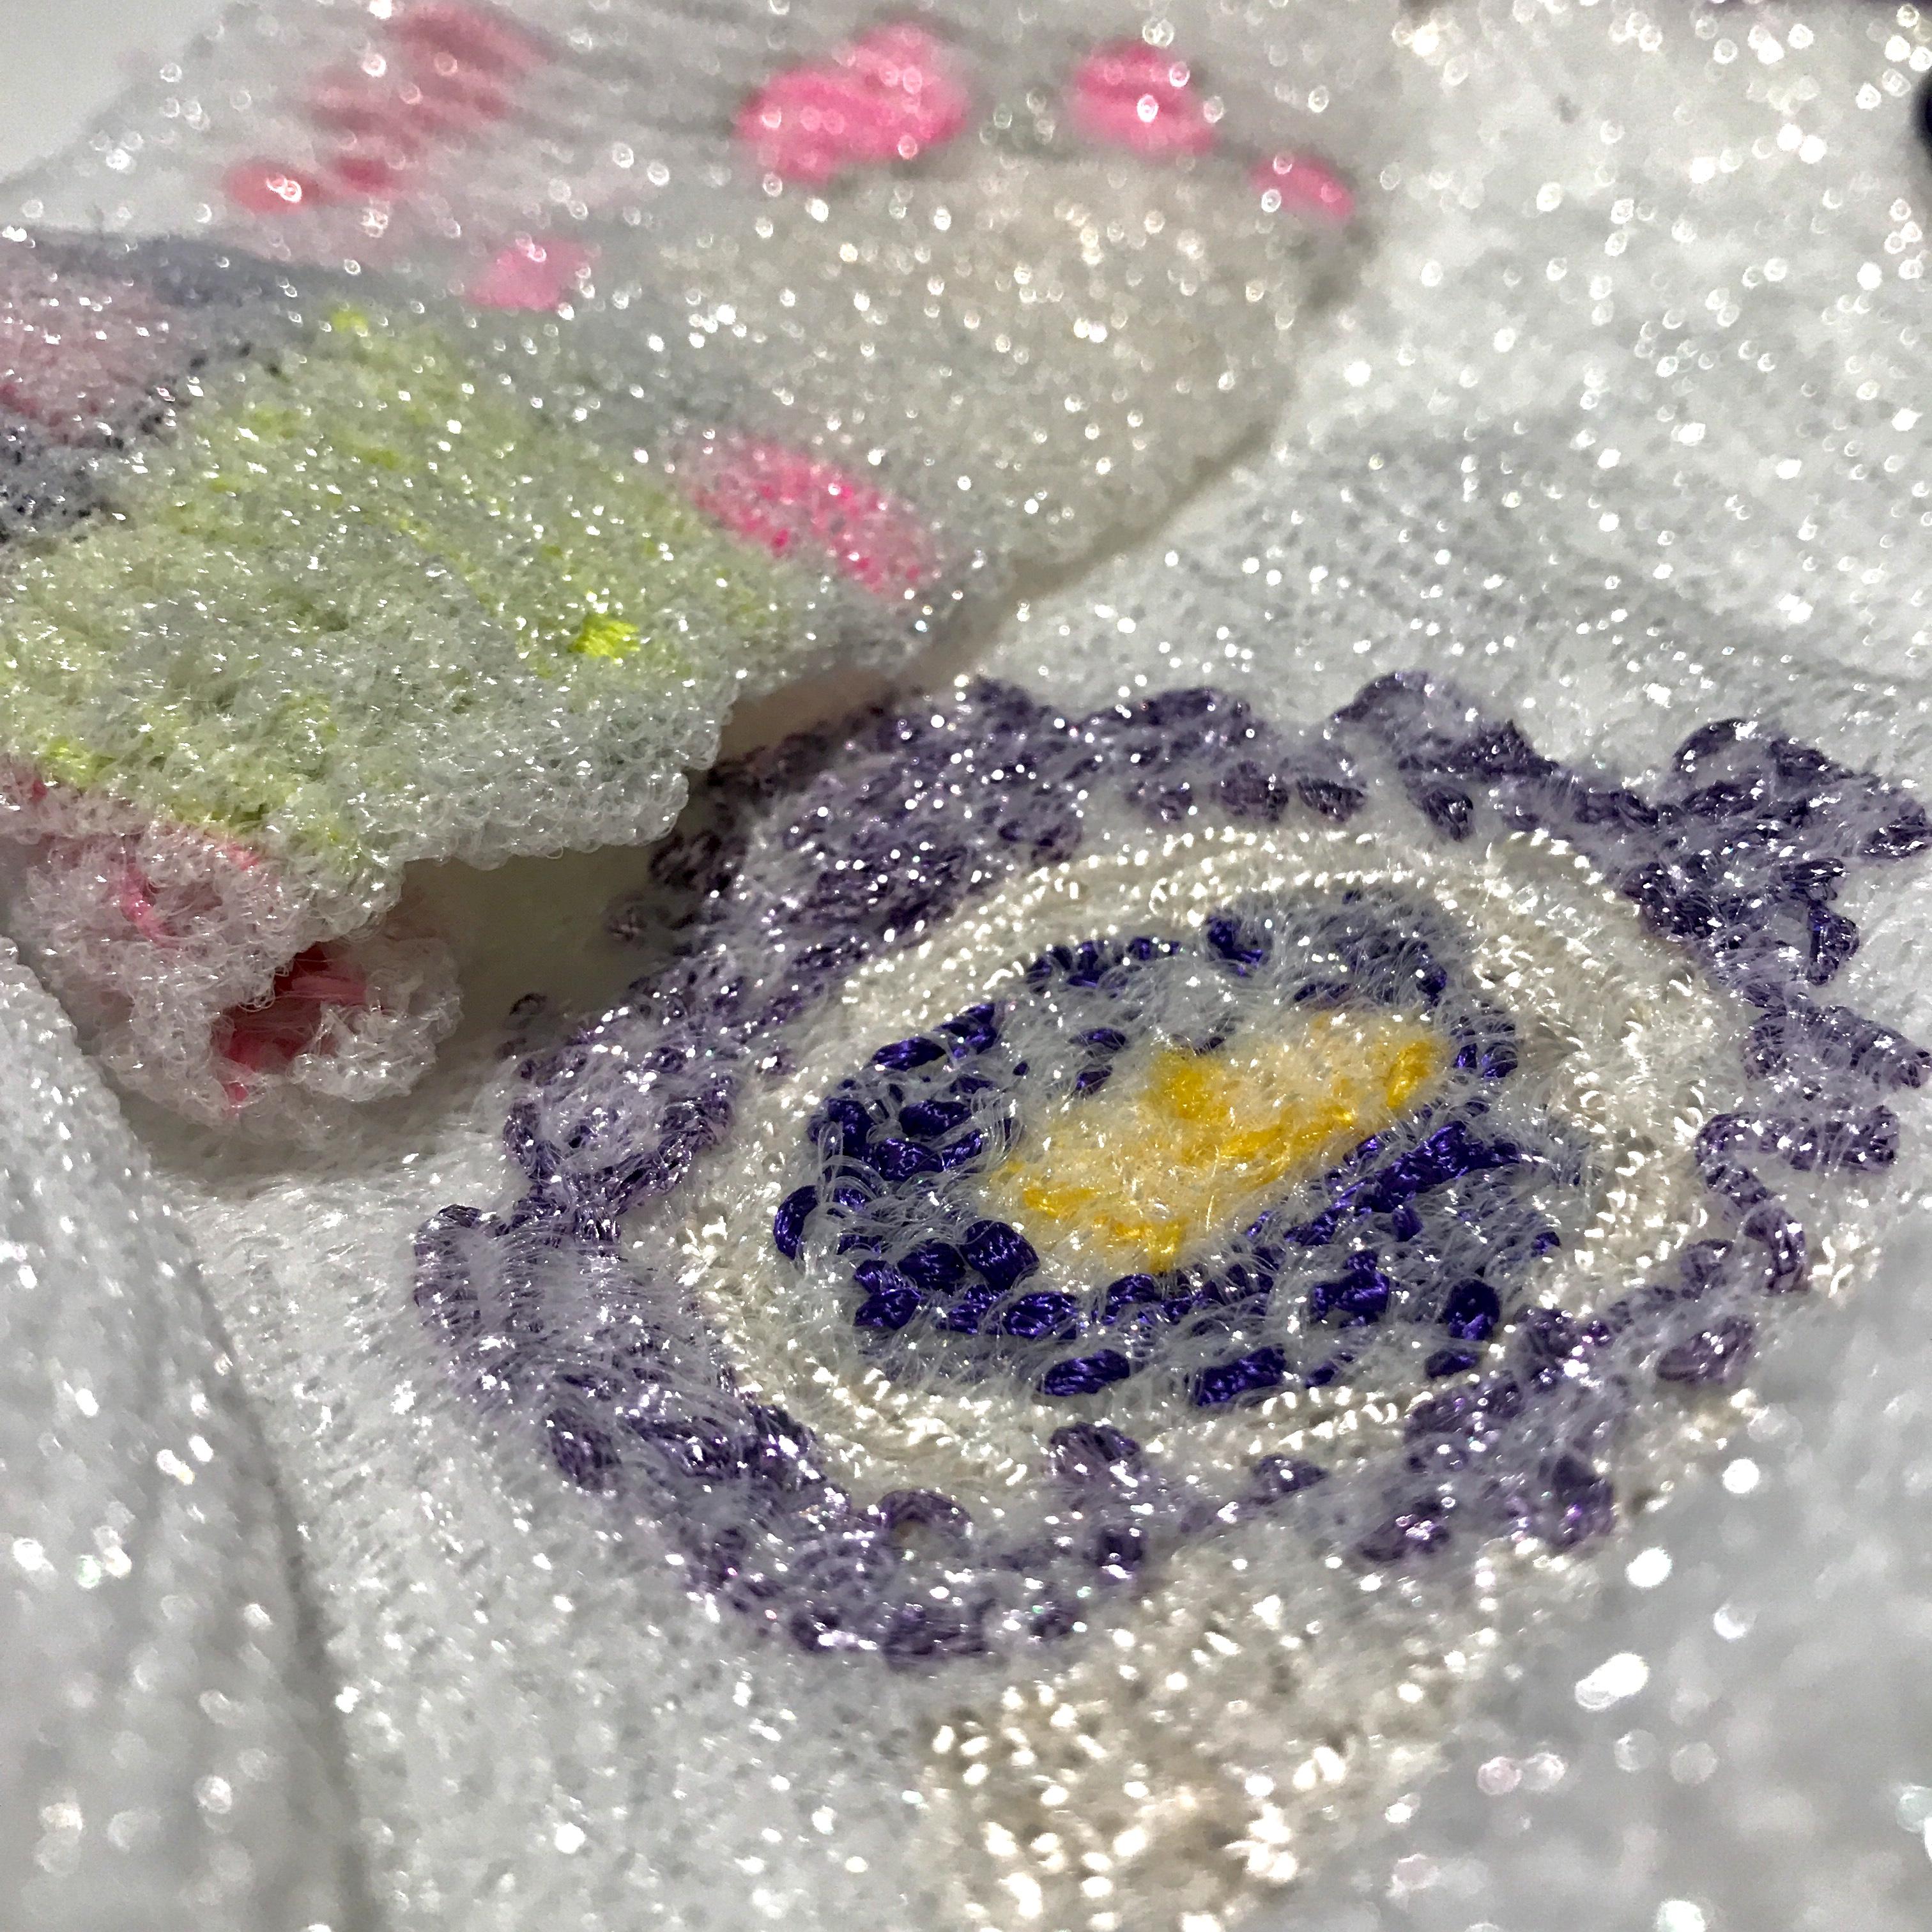 Image: Yunzhi Wang, RCA MA Textiles